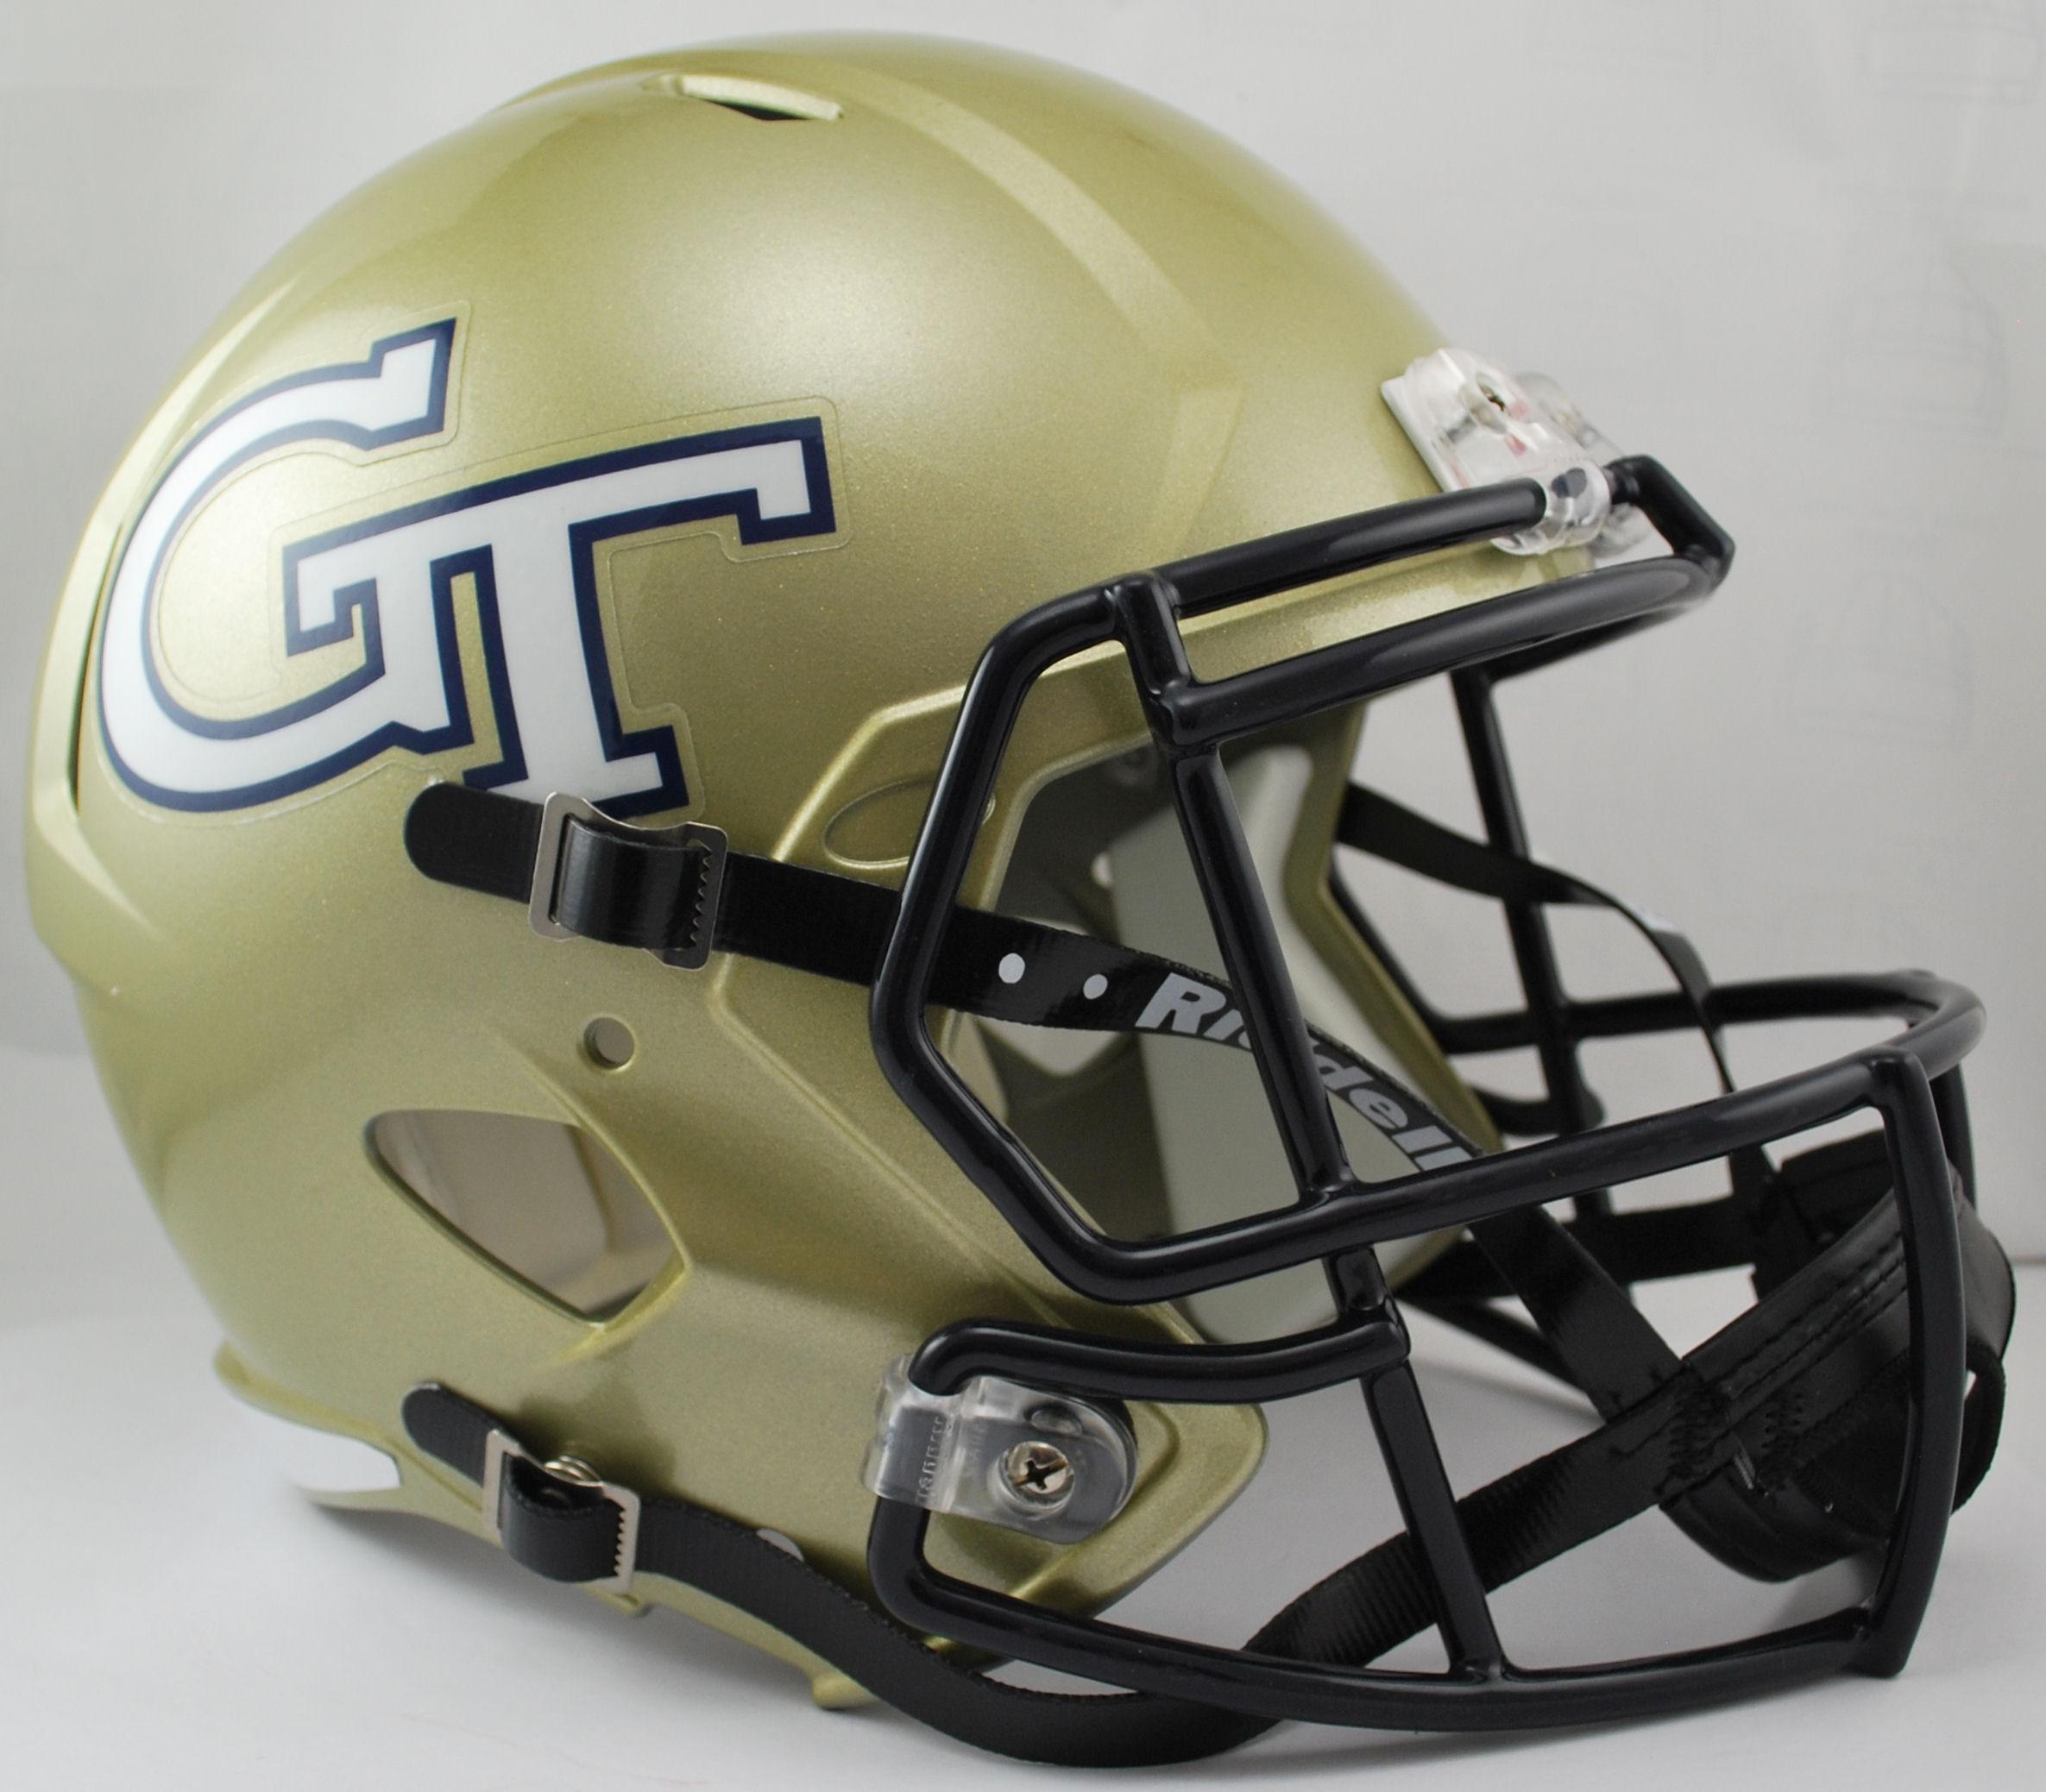 Georgia Tech Yellow Jackets Speed Replica Football Helmet